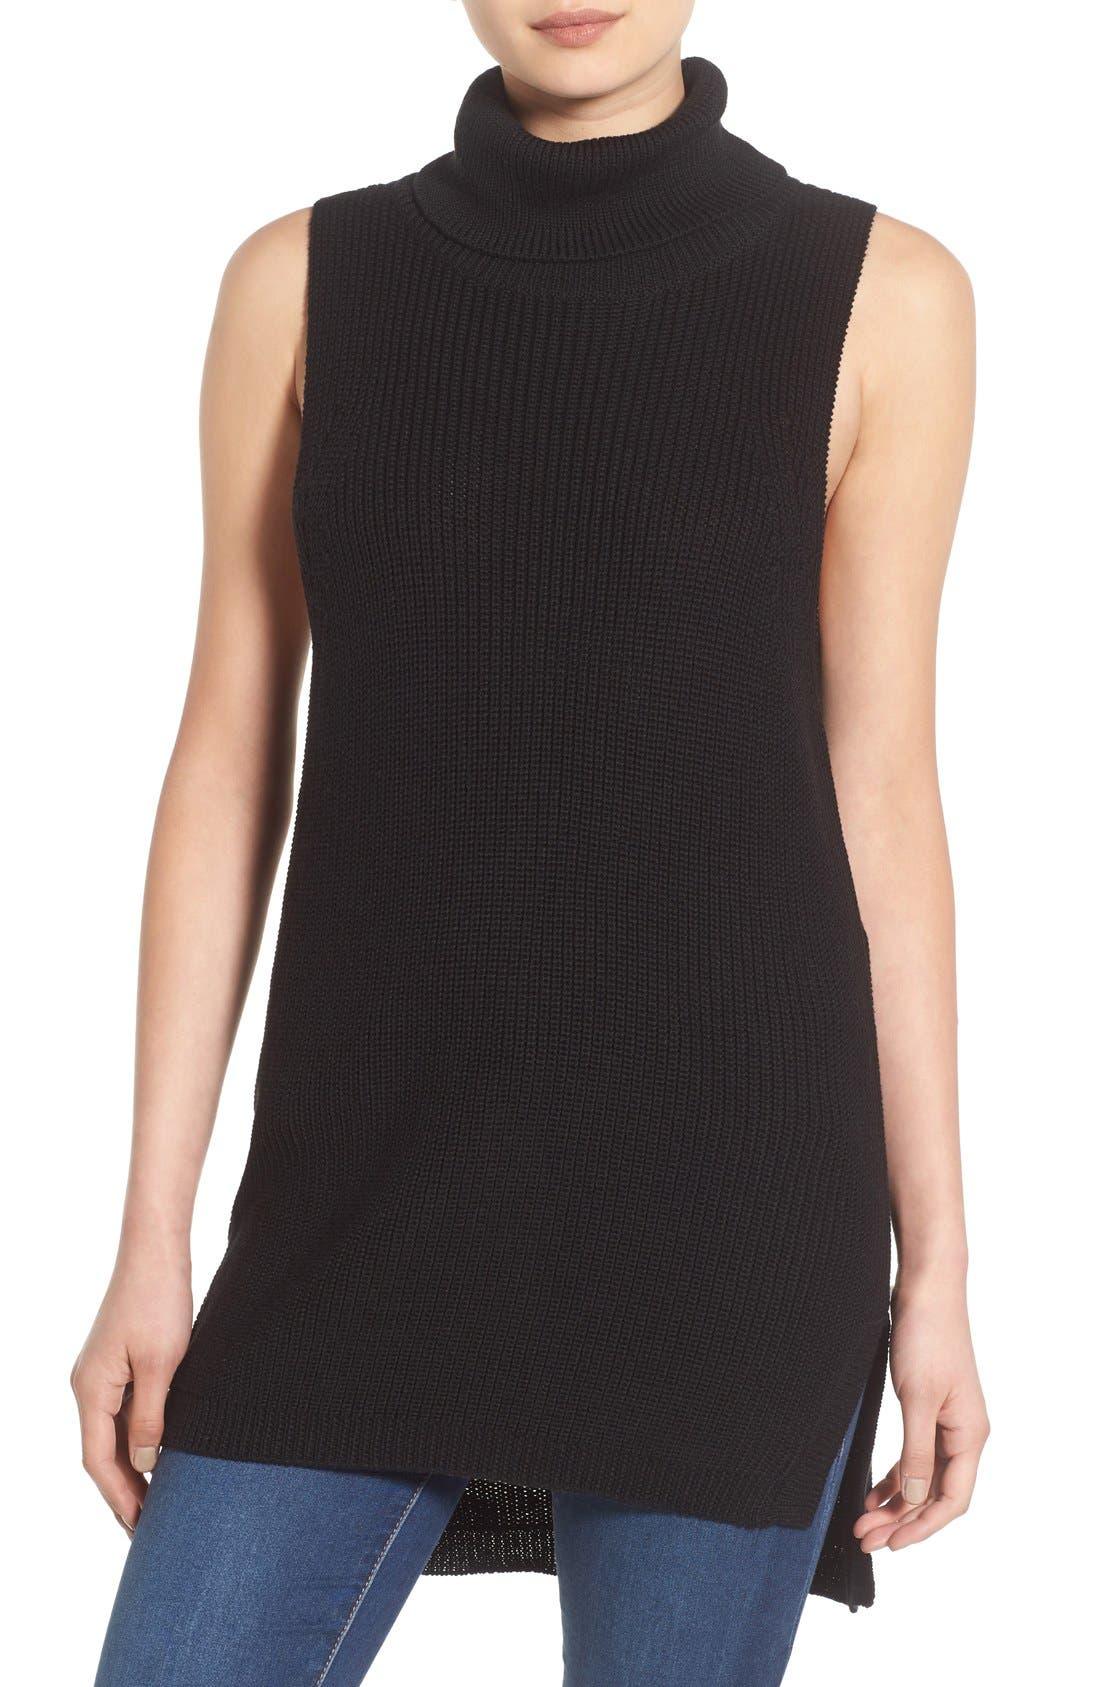 Alternate Image 1 Selected - BP. Sleeveless Turtleneck Sweater